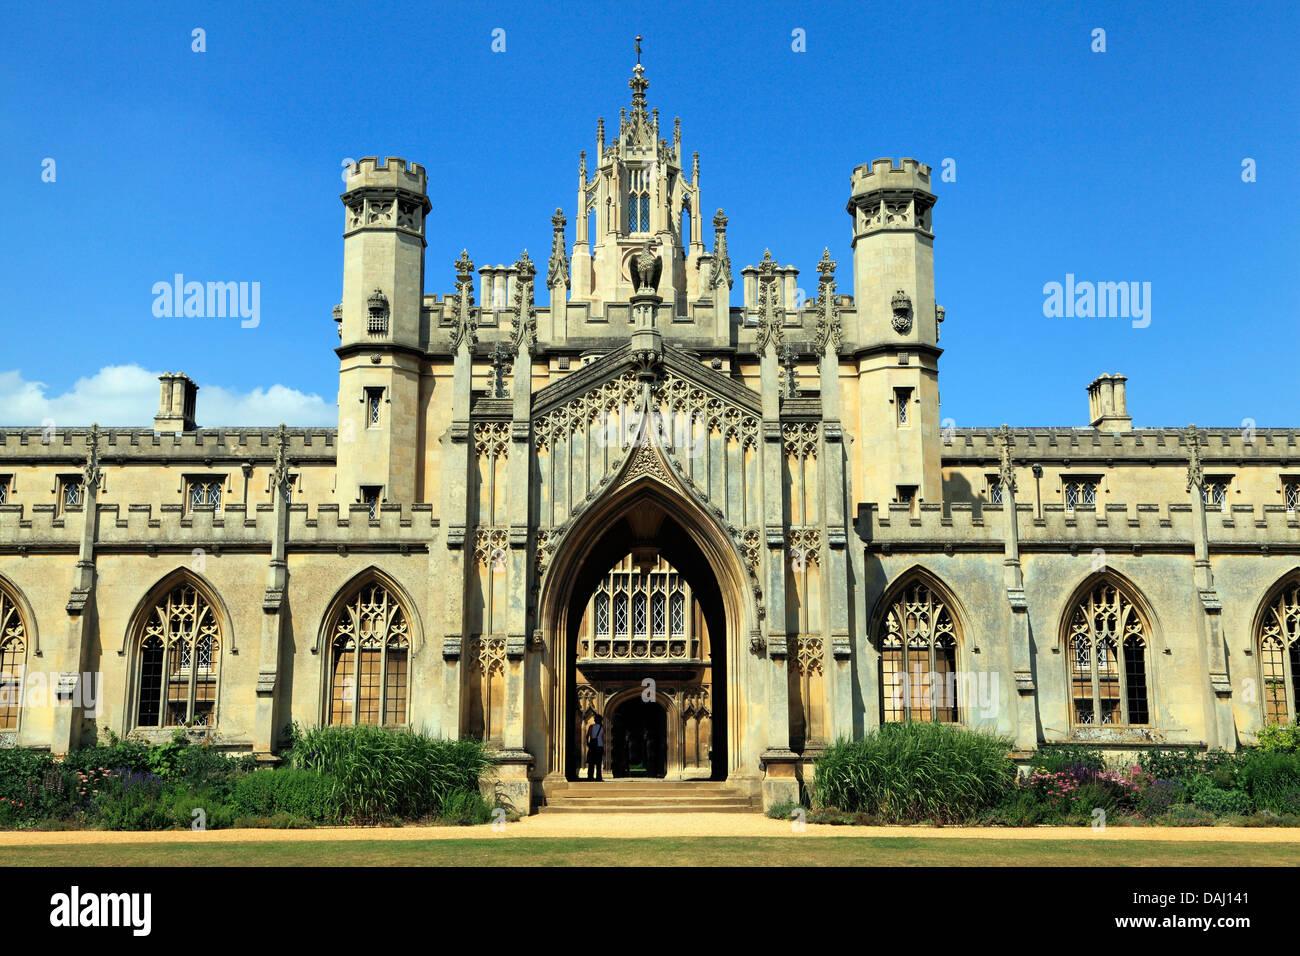 St. Johns College, Cambridge, England UK, English university universities colleges - Stock Image